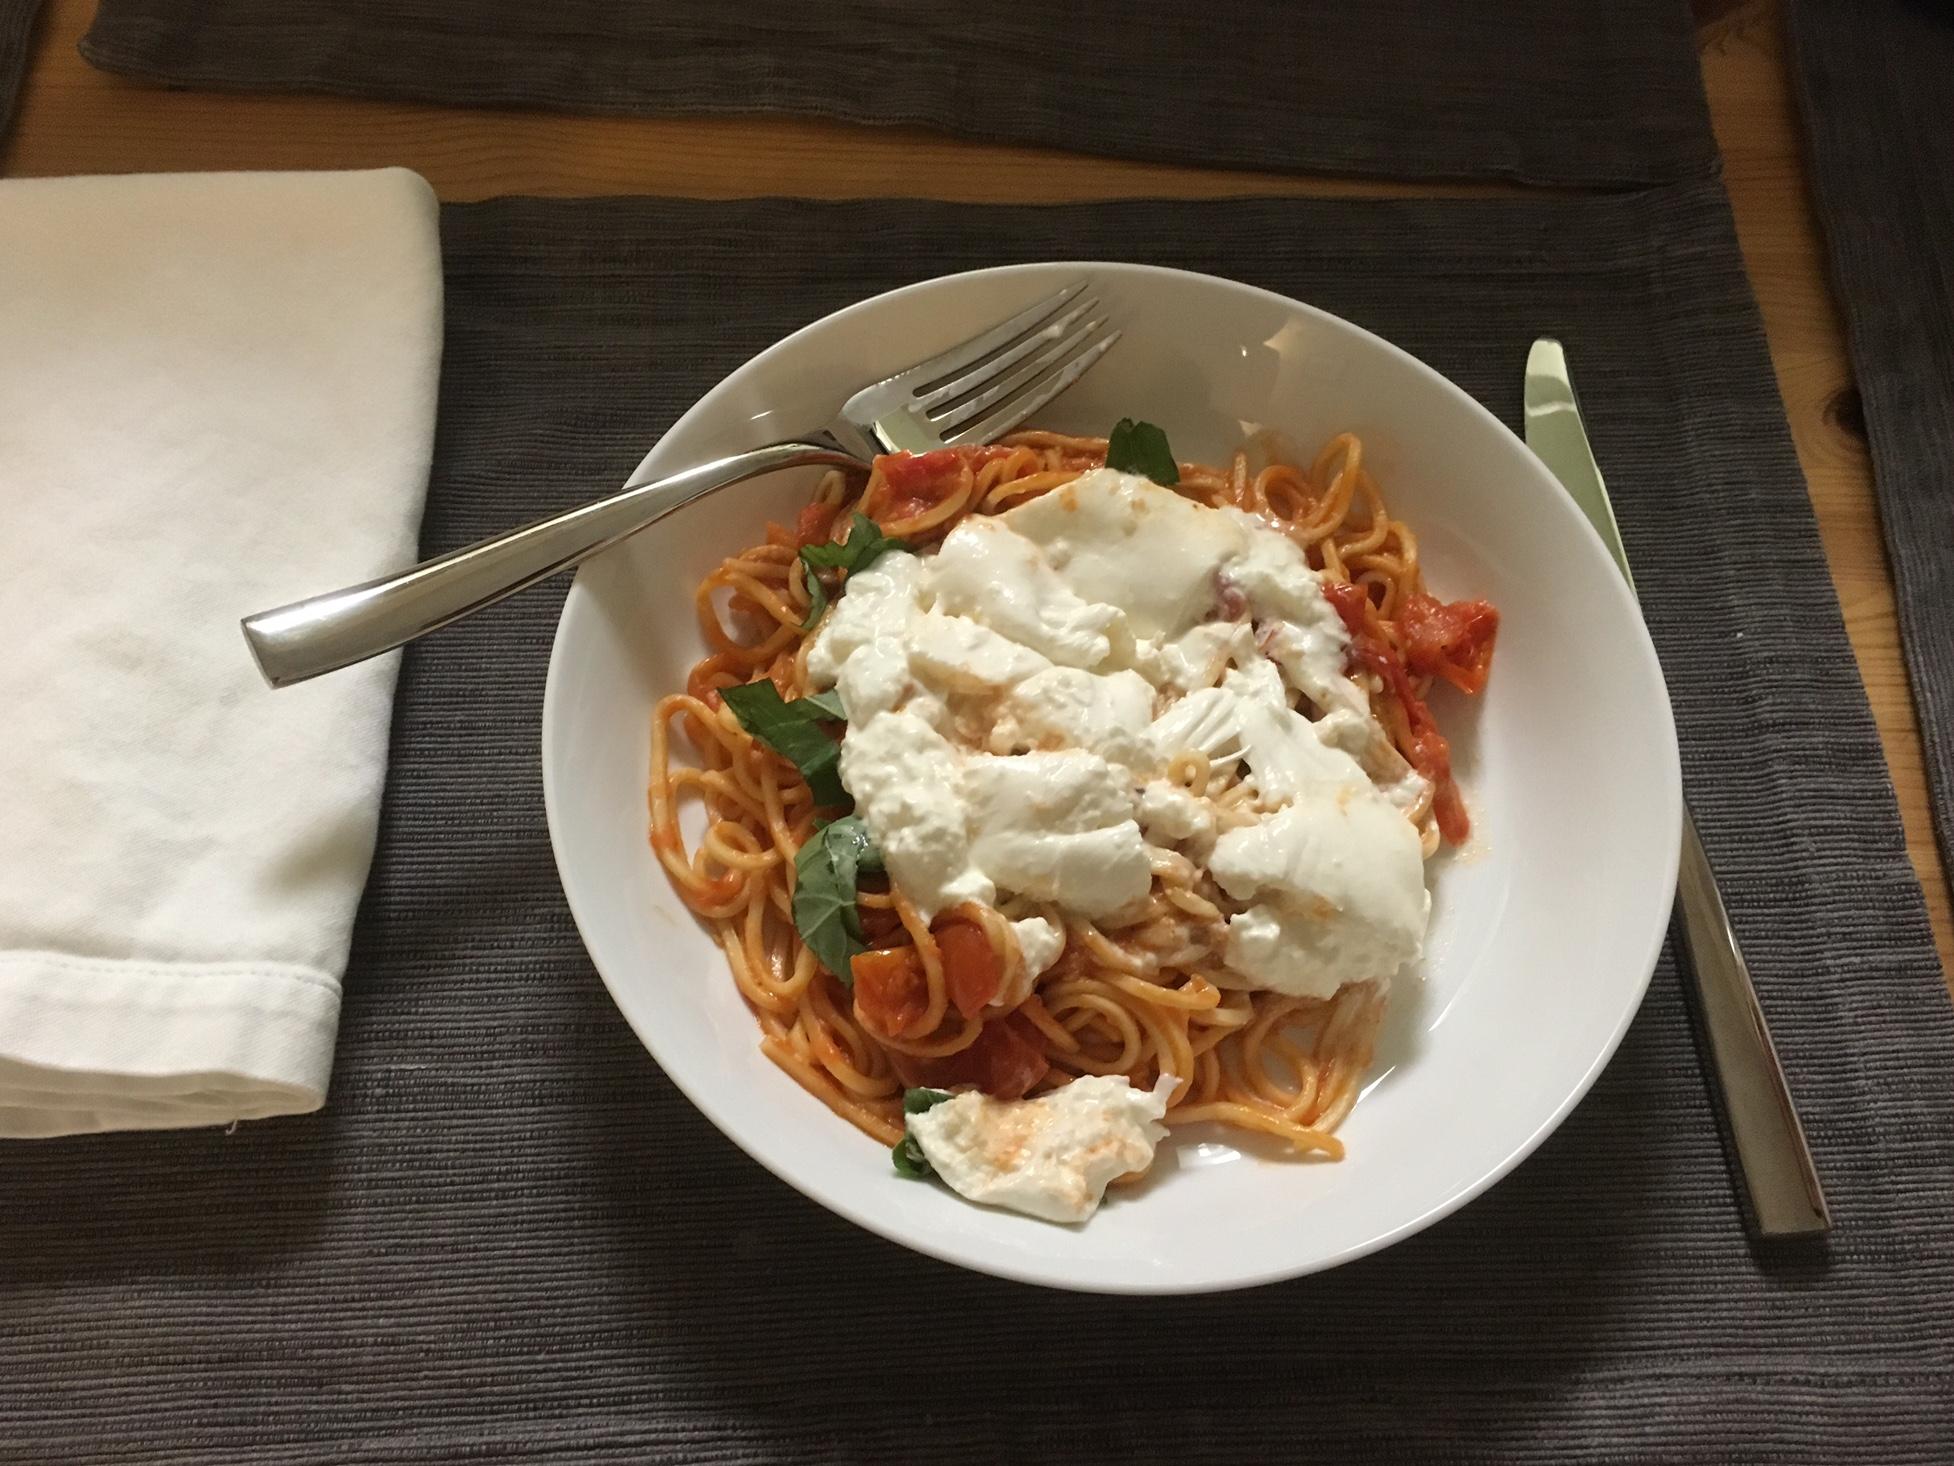 Spaghetti with burrata.